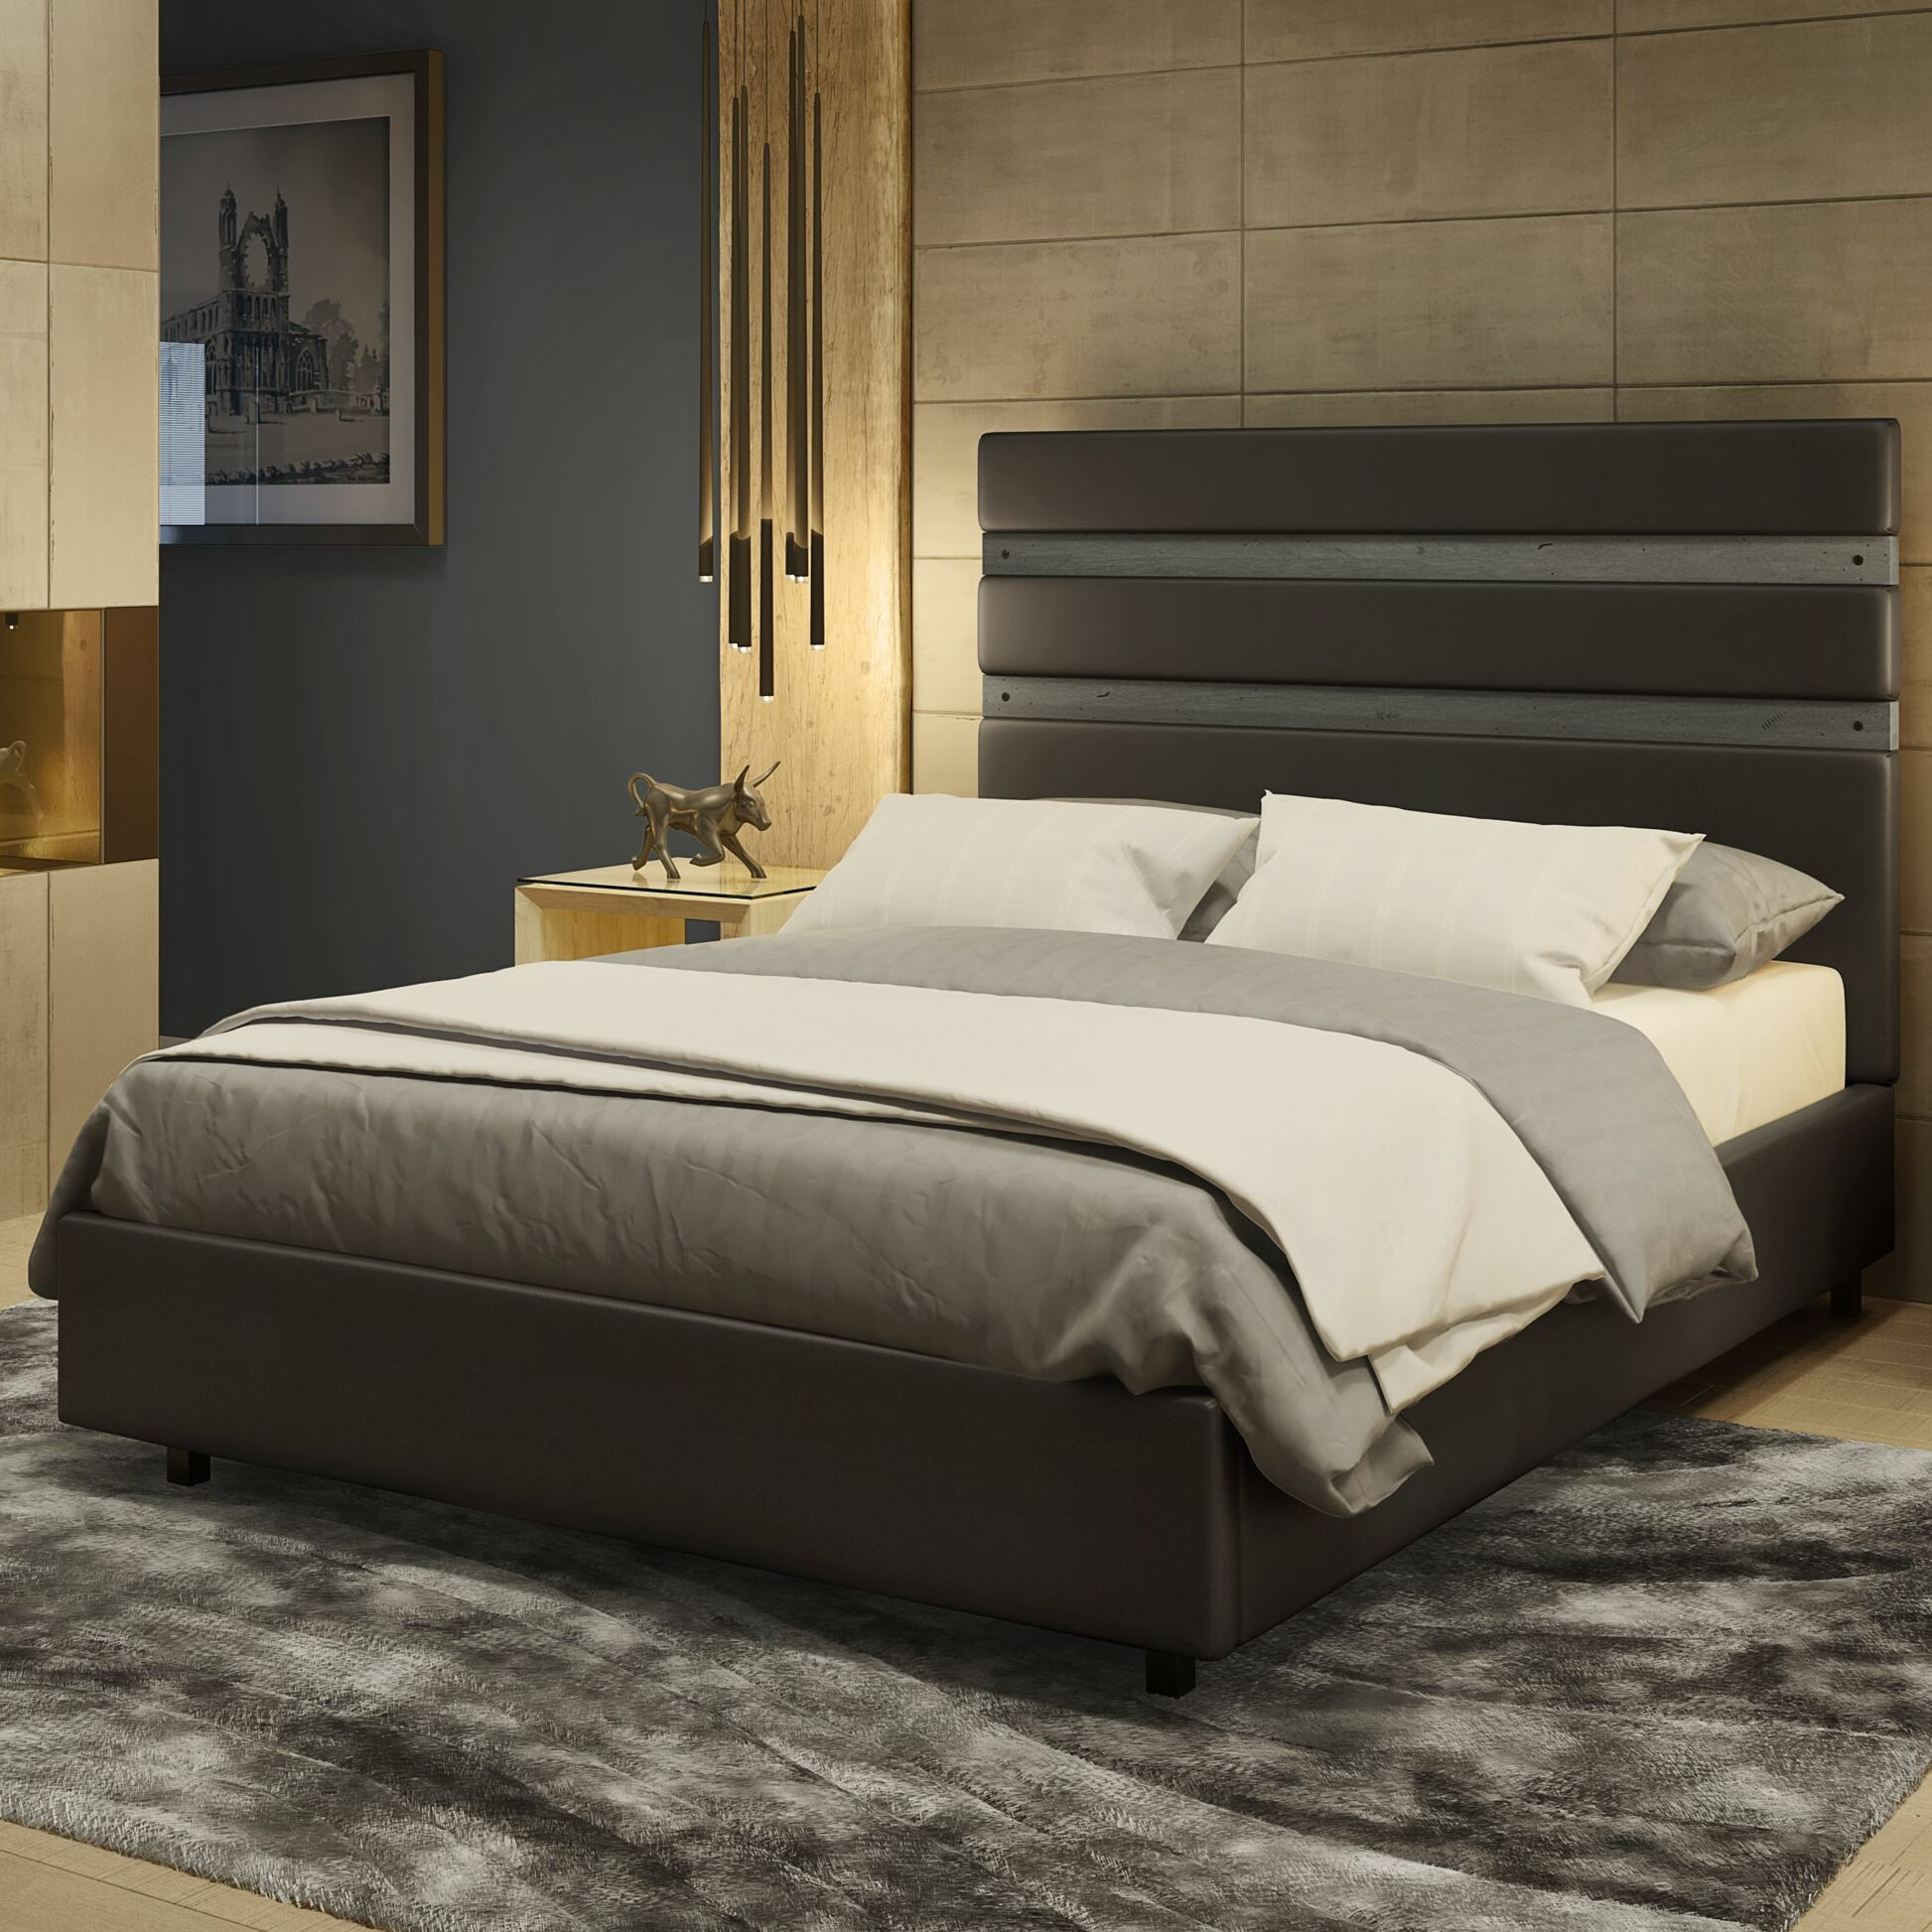 Dunder Upholstered Platform Bed Color: Charcoal/Gray, Size: Queen